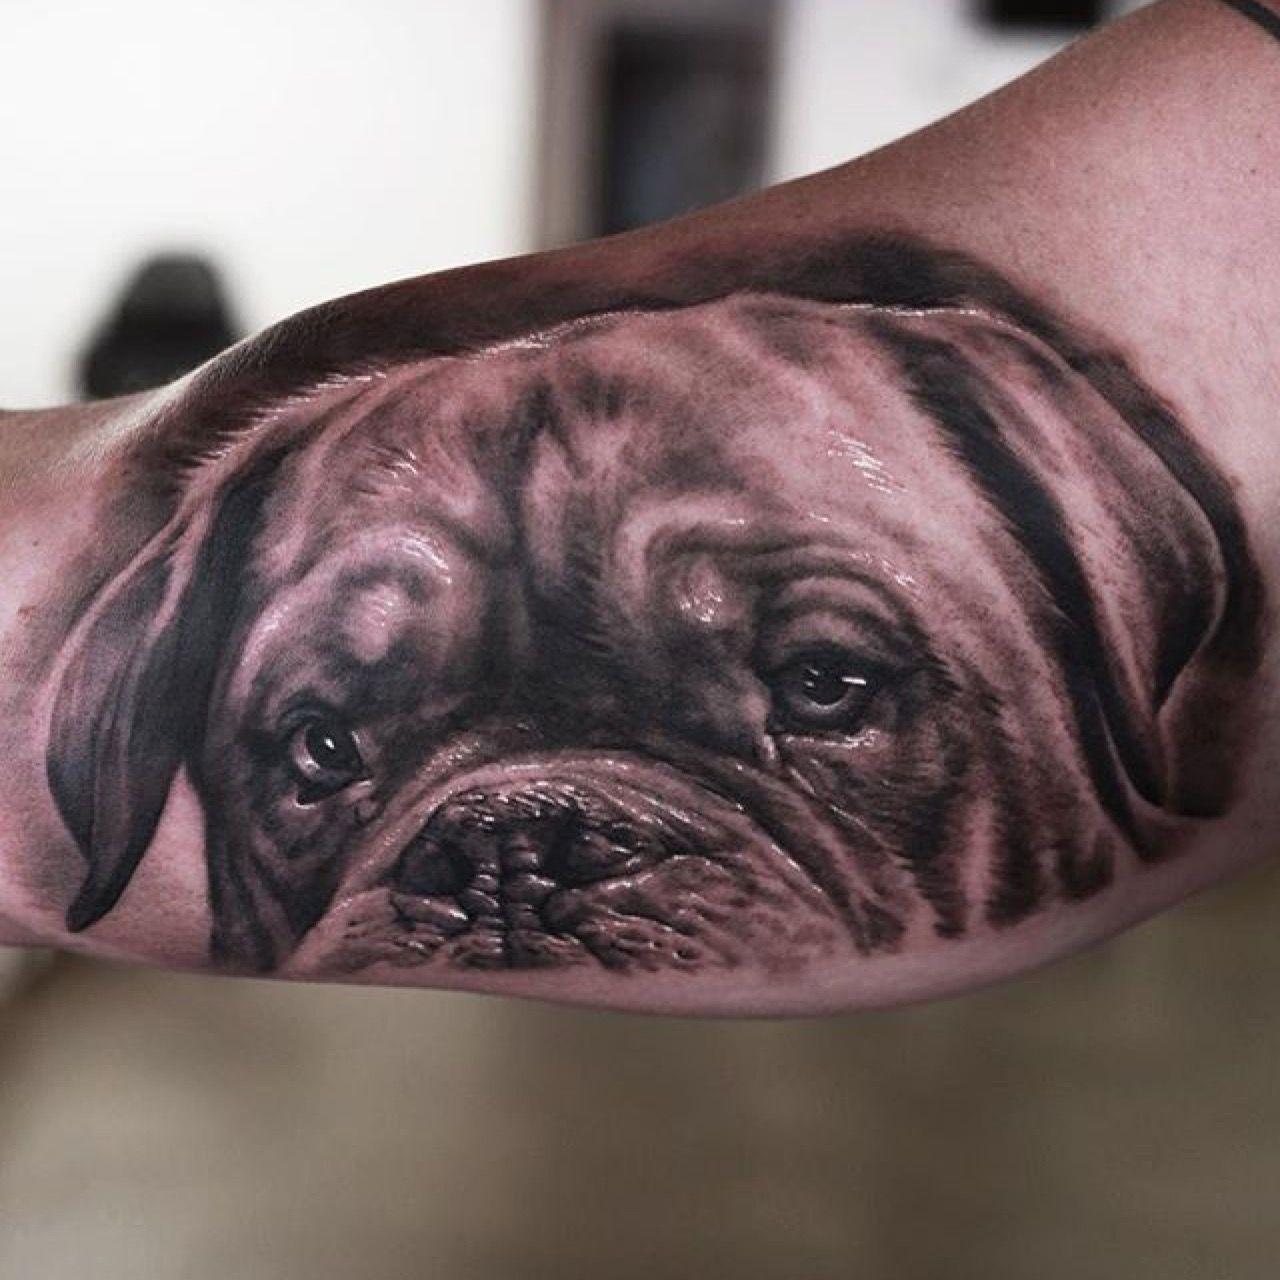 Dogue De Bordeaux Tattoo Black And Grey Fyink Seunghyunjotattoos Dogo De Burdeos Burdeos Tatuajes